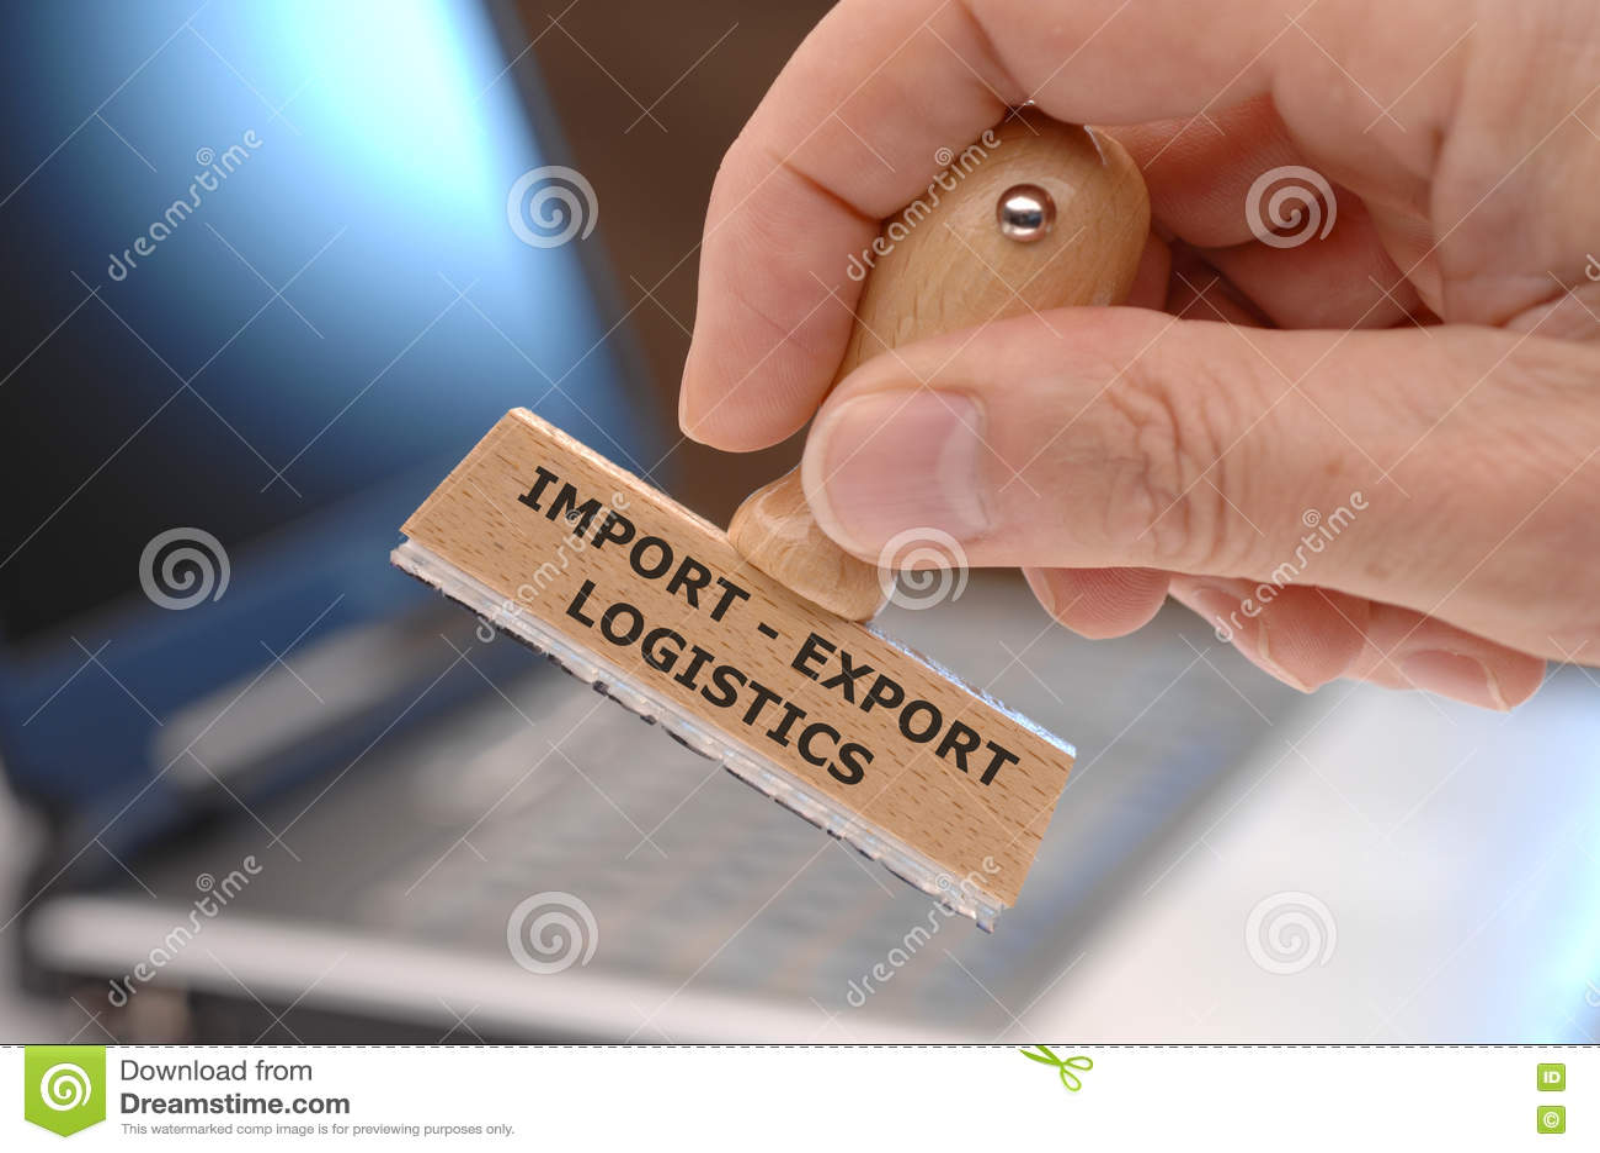 Import - exportlogistik